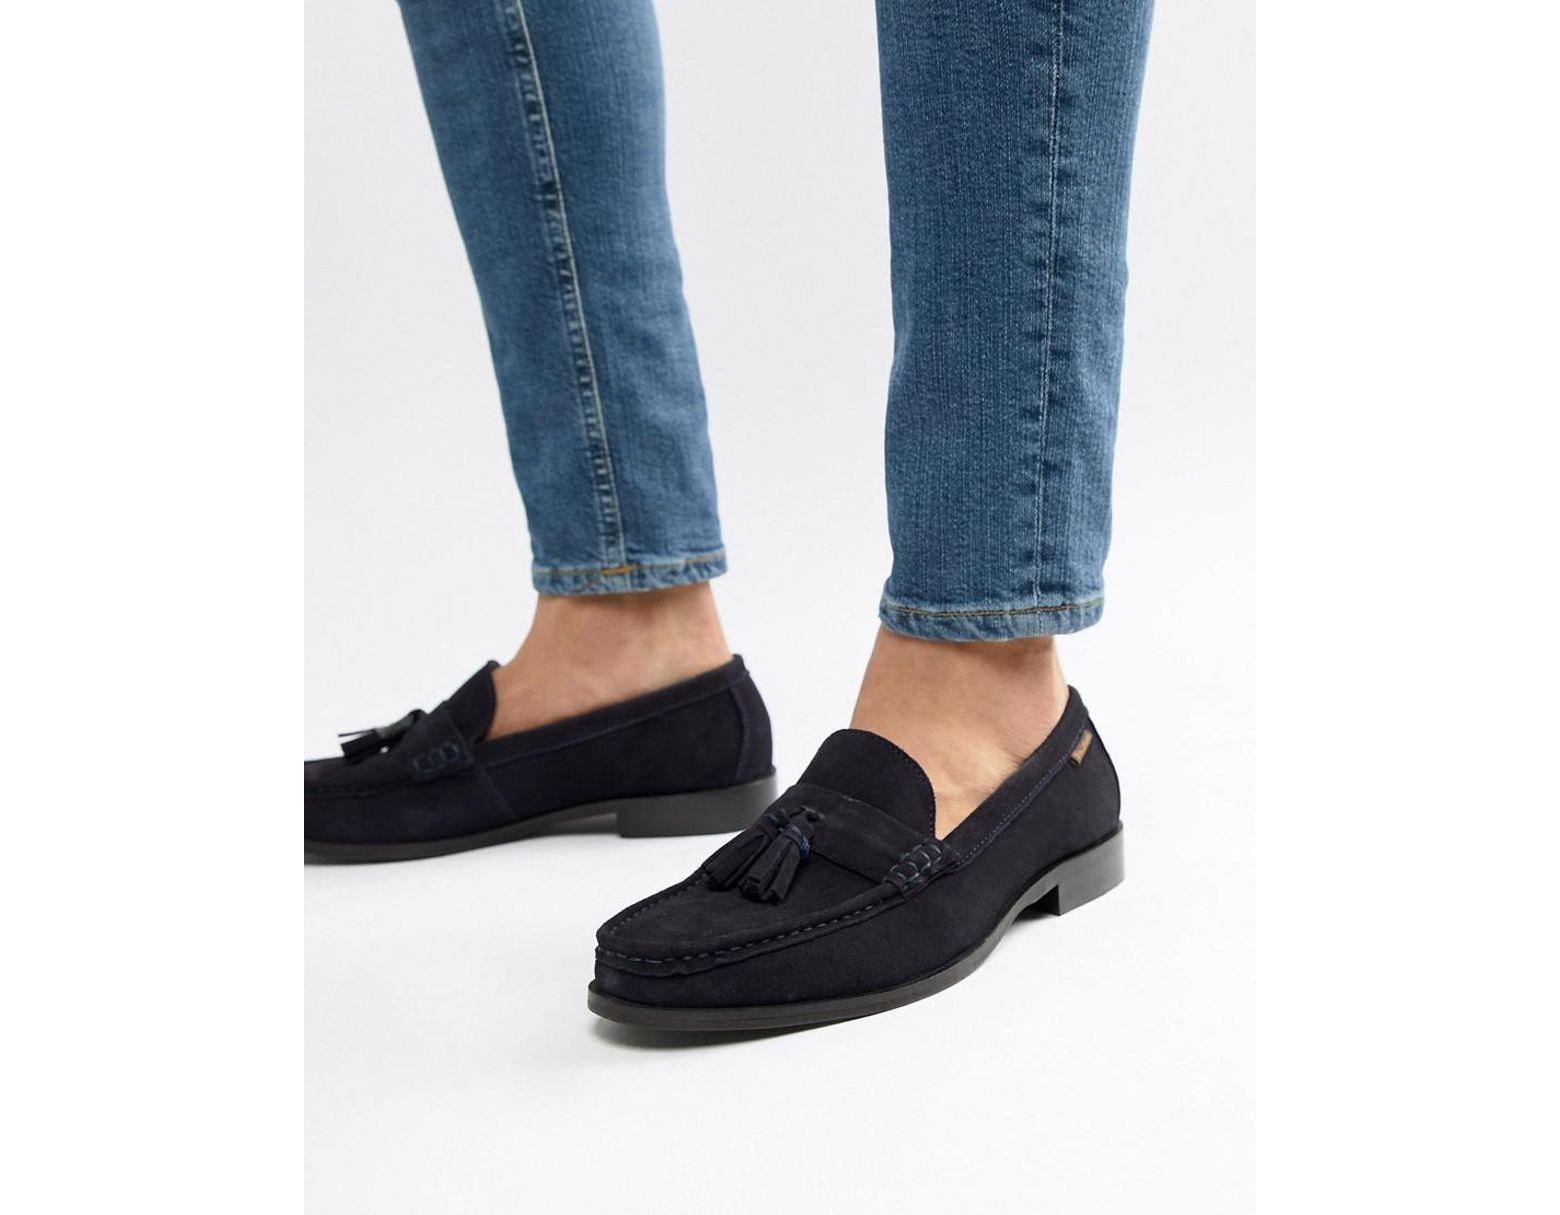 8e3585746f8a Ben Sherman Loafers Tassel Loafers In Navy Suede in Blue for Men - Lyst